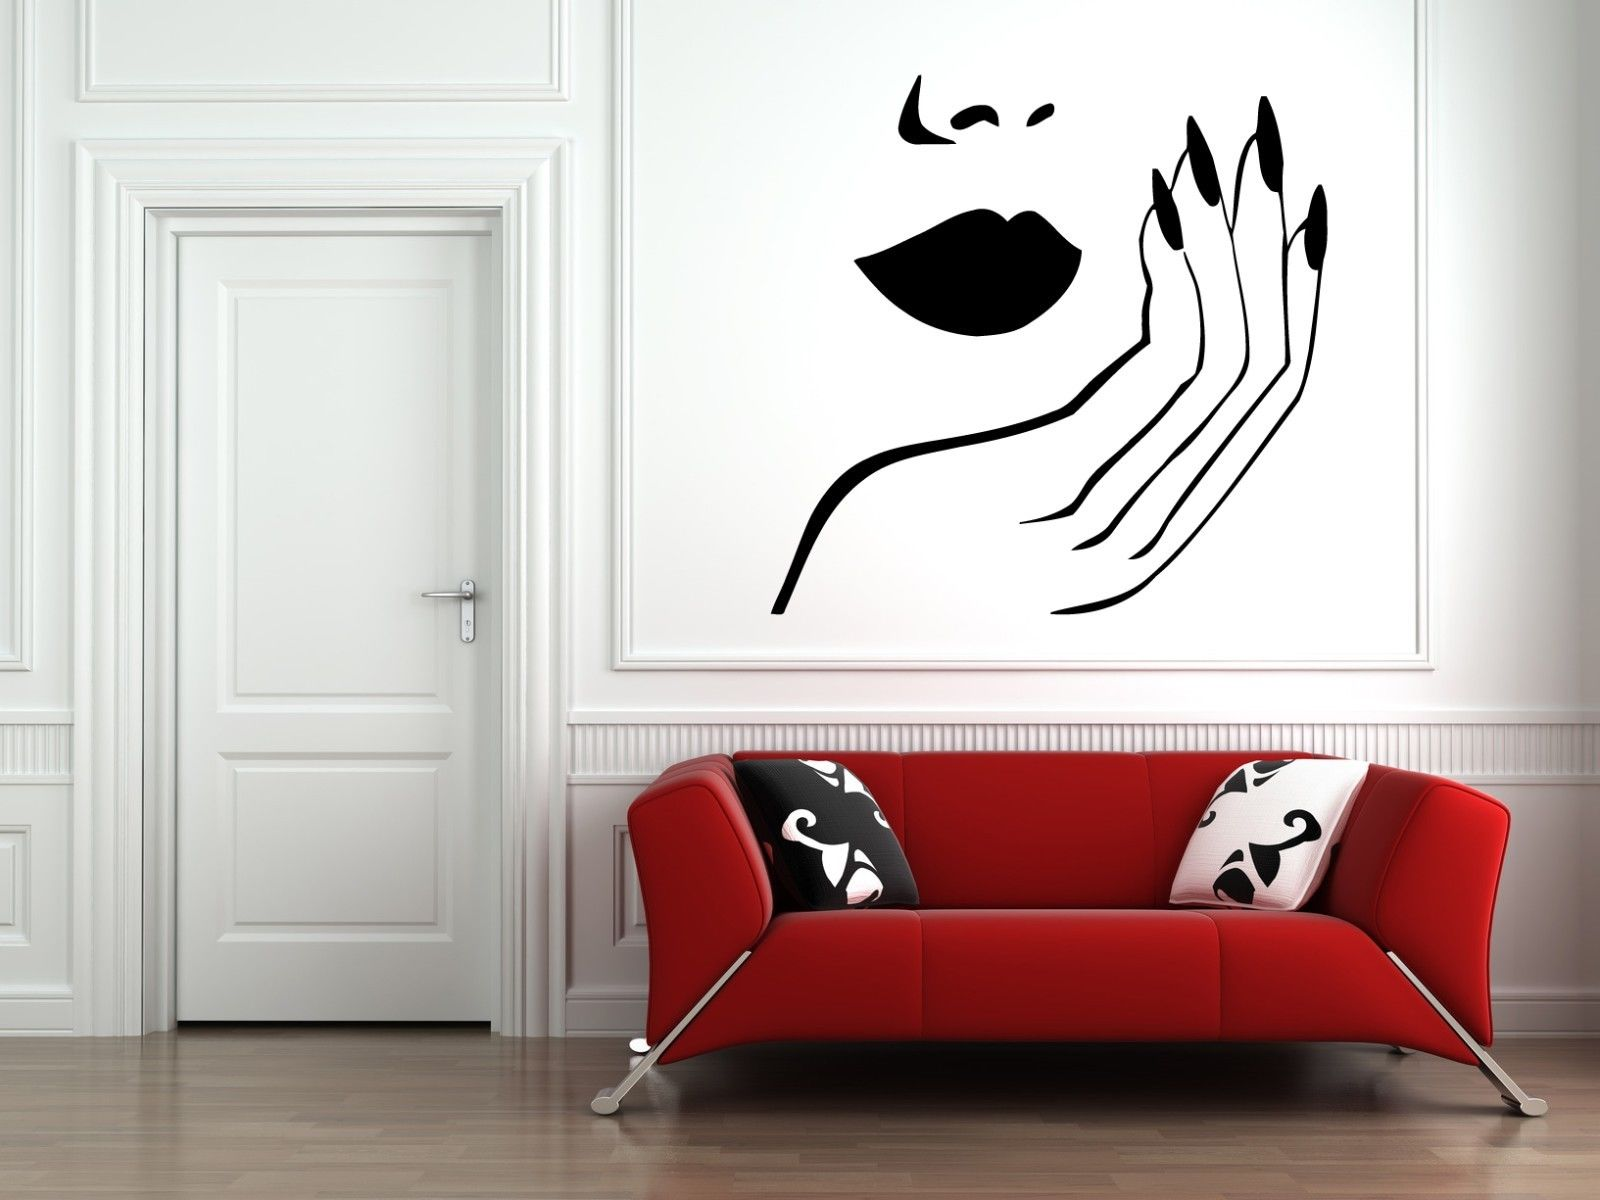 HWHD Wall Decal Sticker bedroom nail salon woman face lips hand nail art cute free shipping